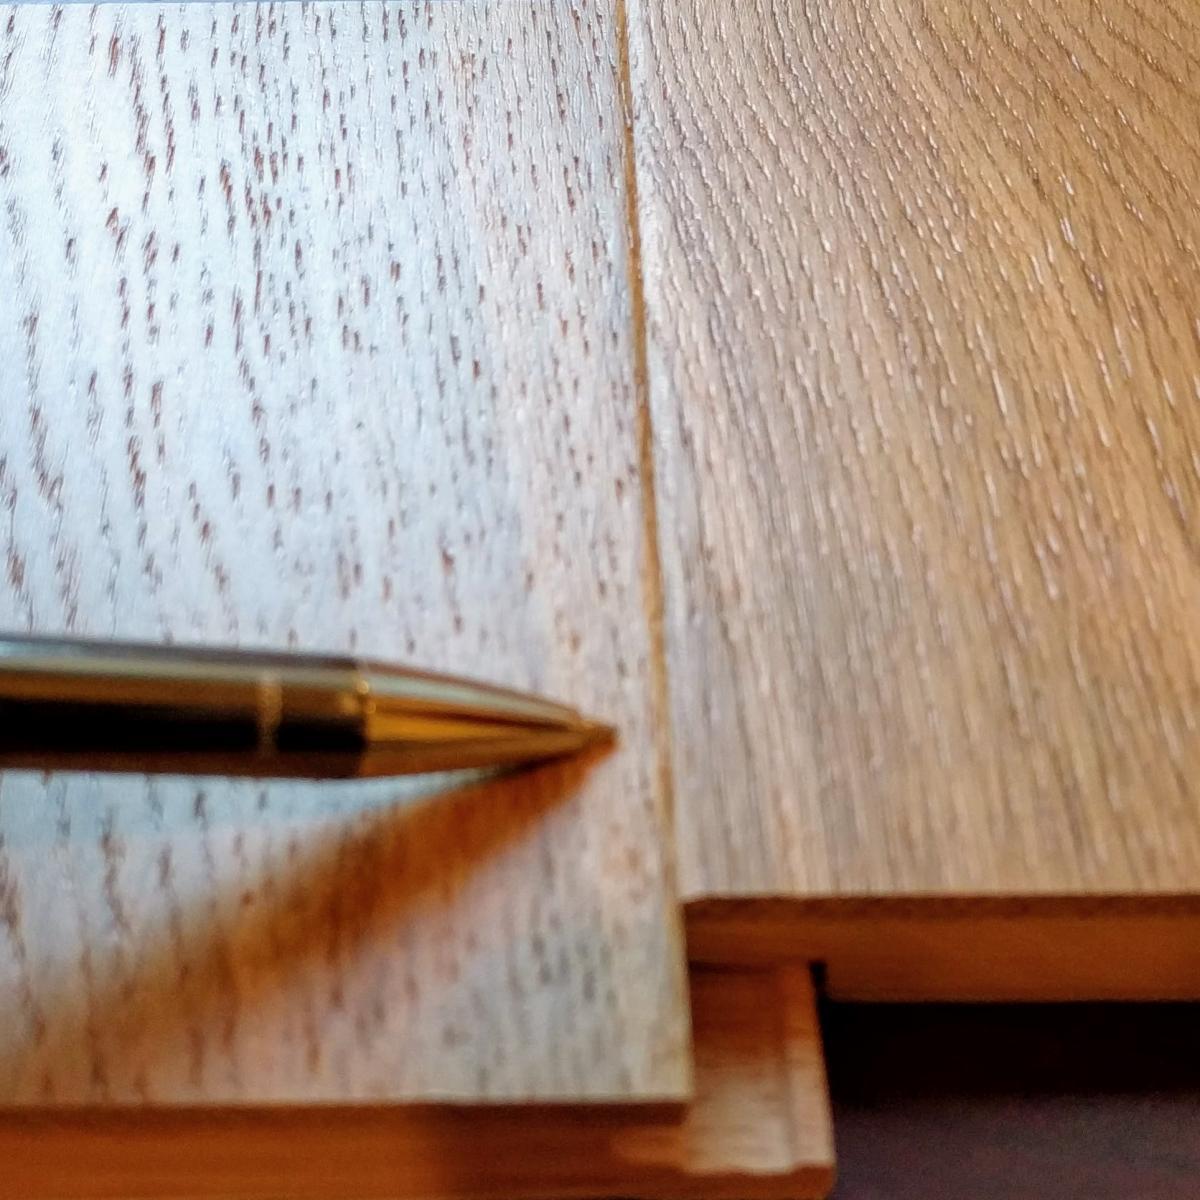 Bevel Micro Bevel And Square Edge Flooring